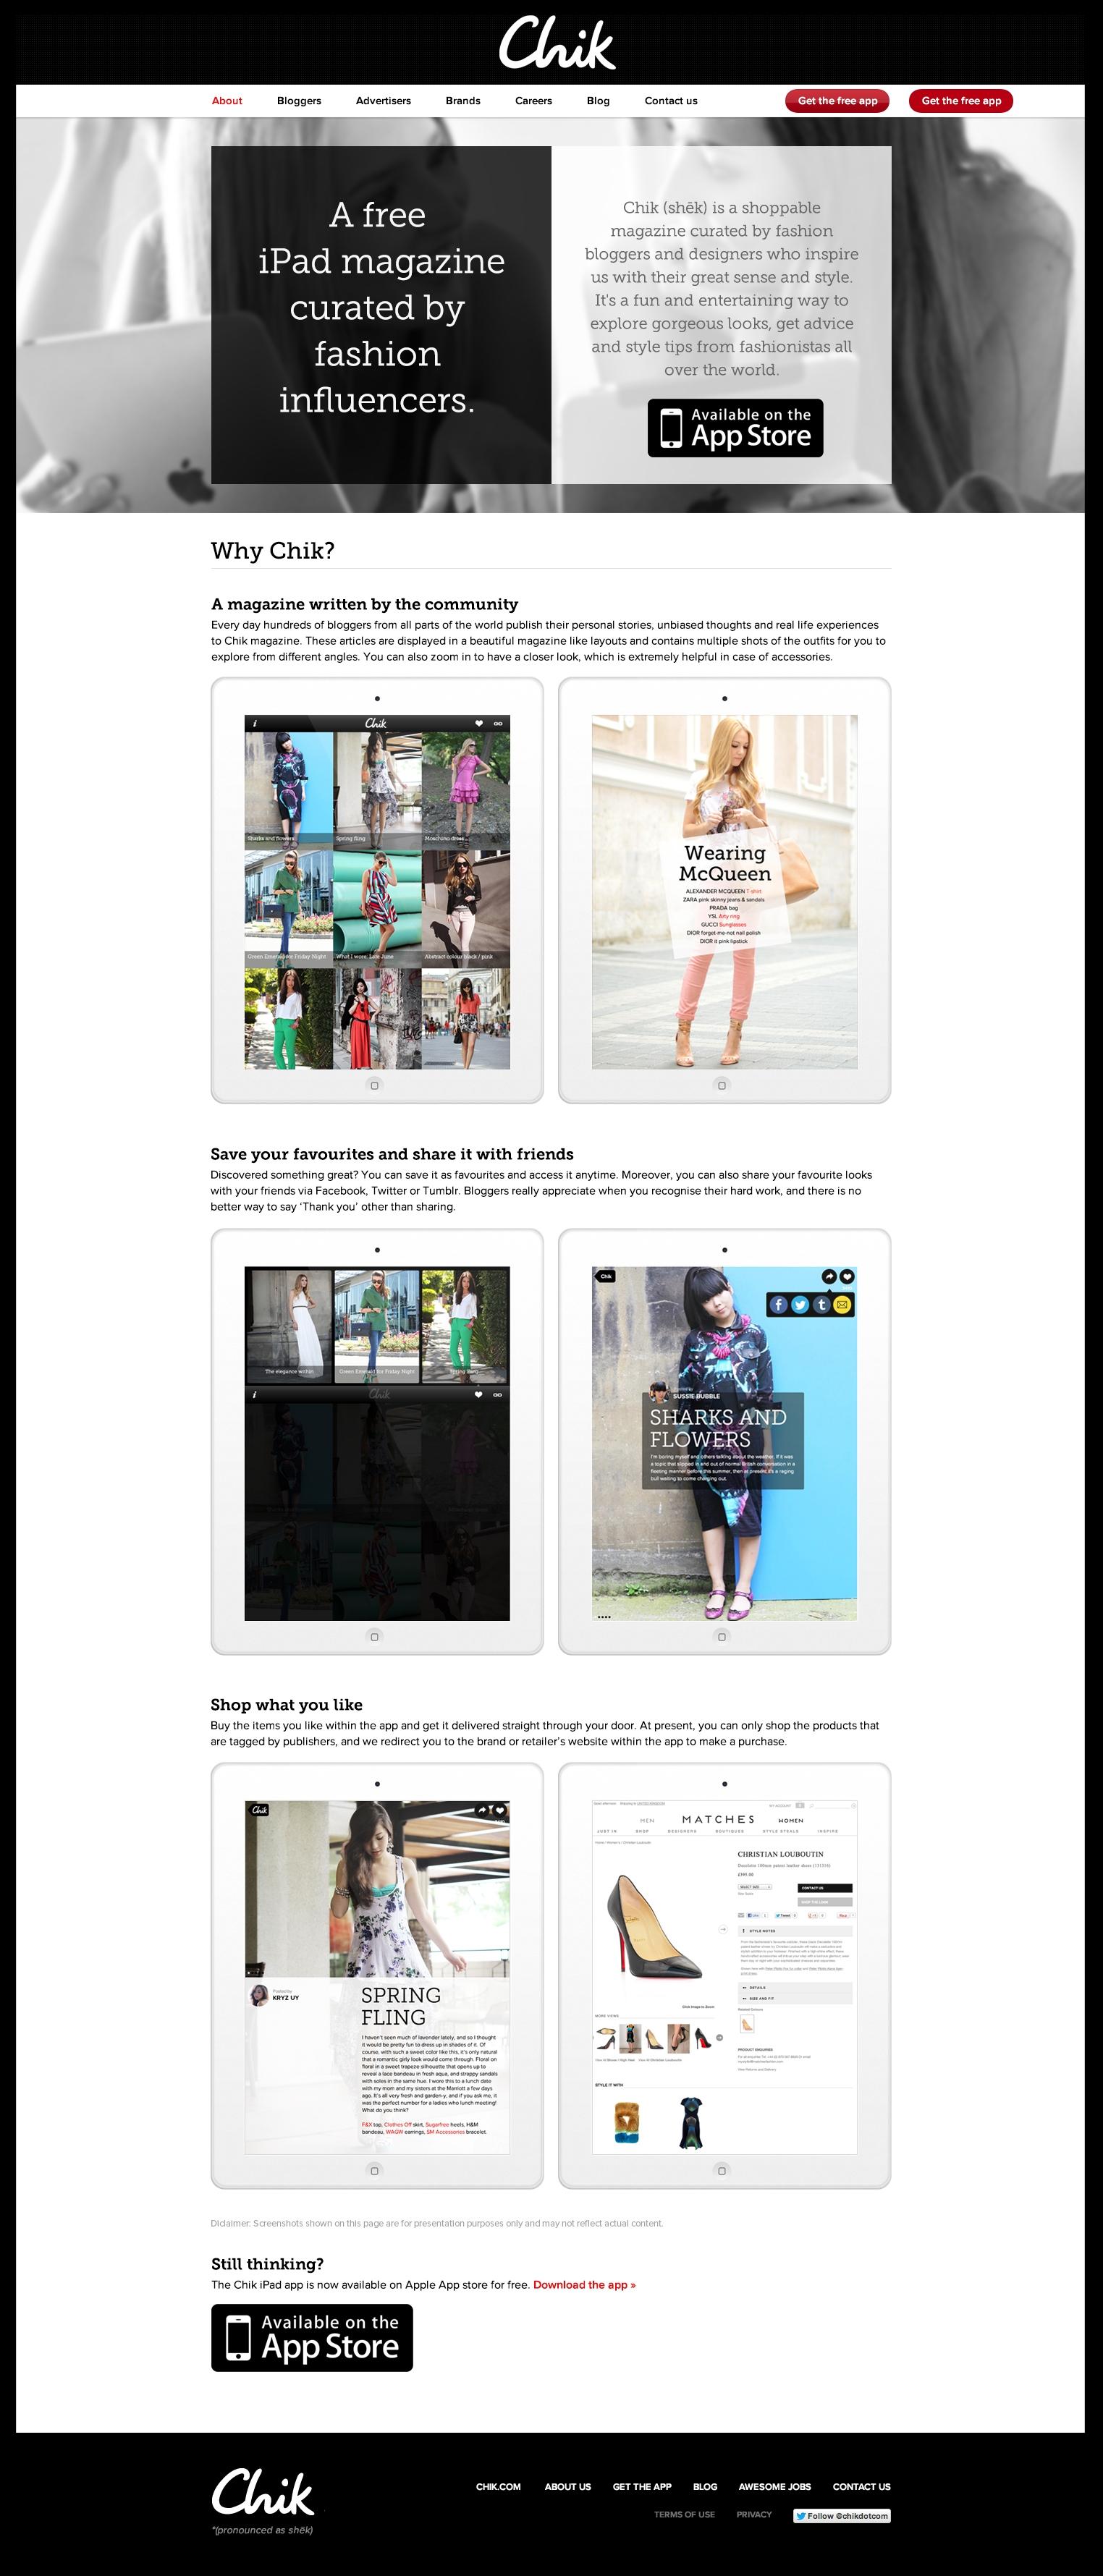 Chik.com about page design